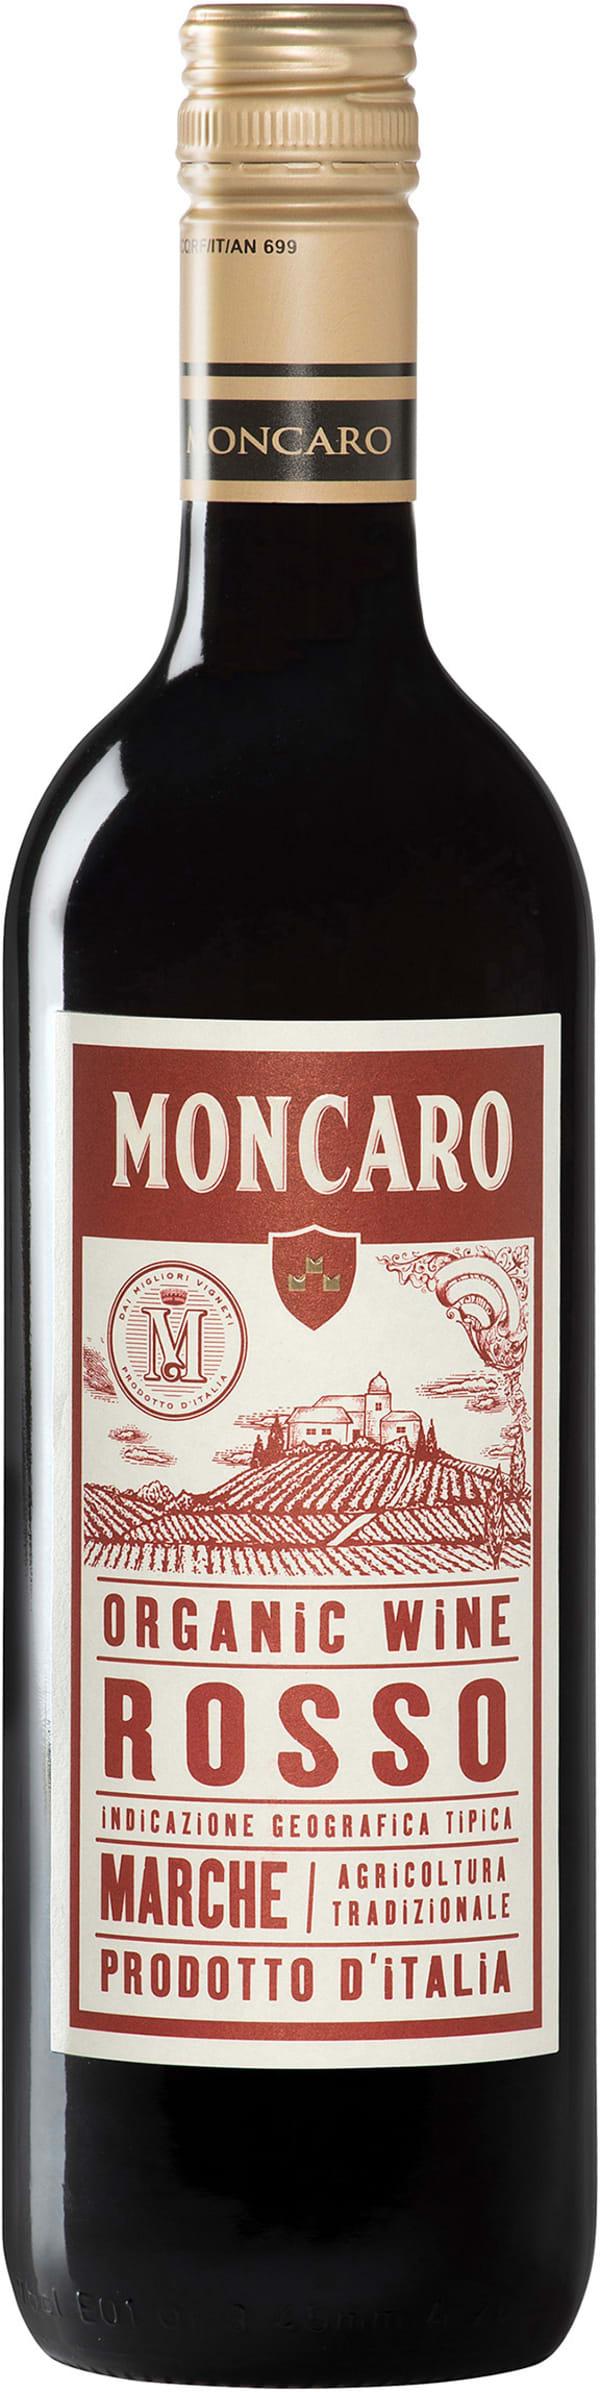 Moncaro Rosso Organic  2016